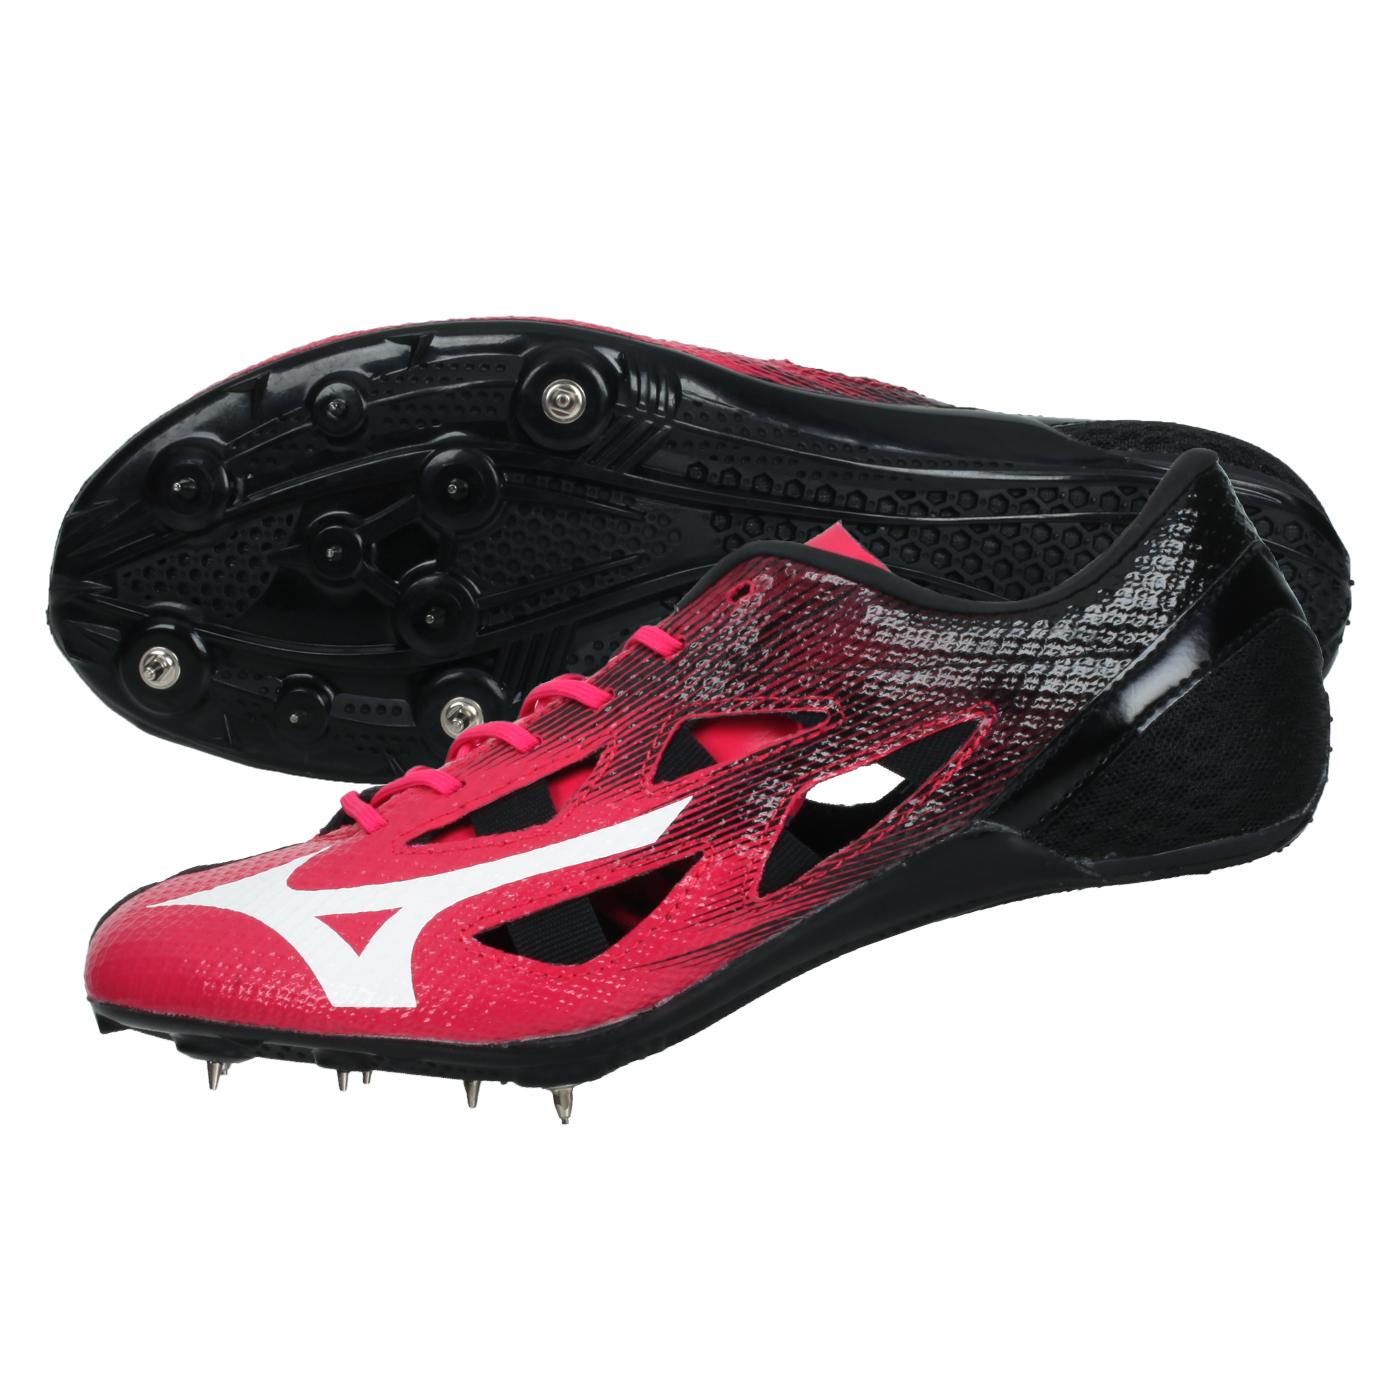 MIZUNO 田徑釘鞋(短距離)  @GEO SILENCER FX@U1GA201260 - 桃紅白黑